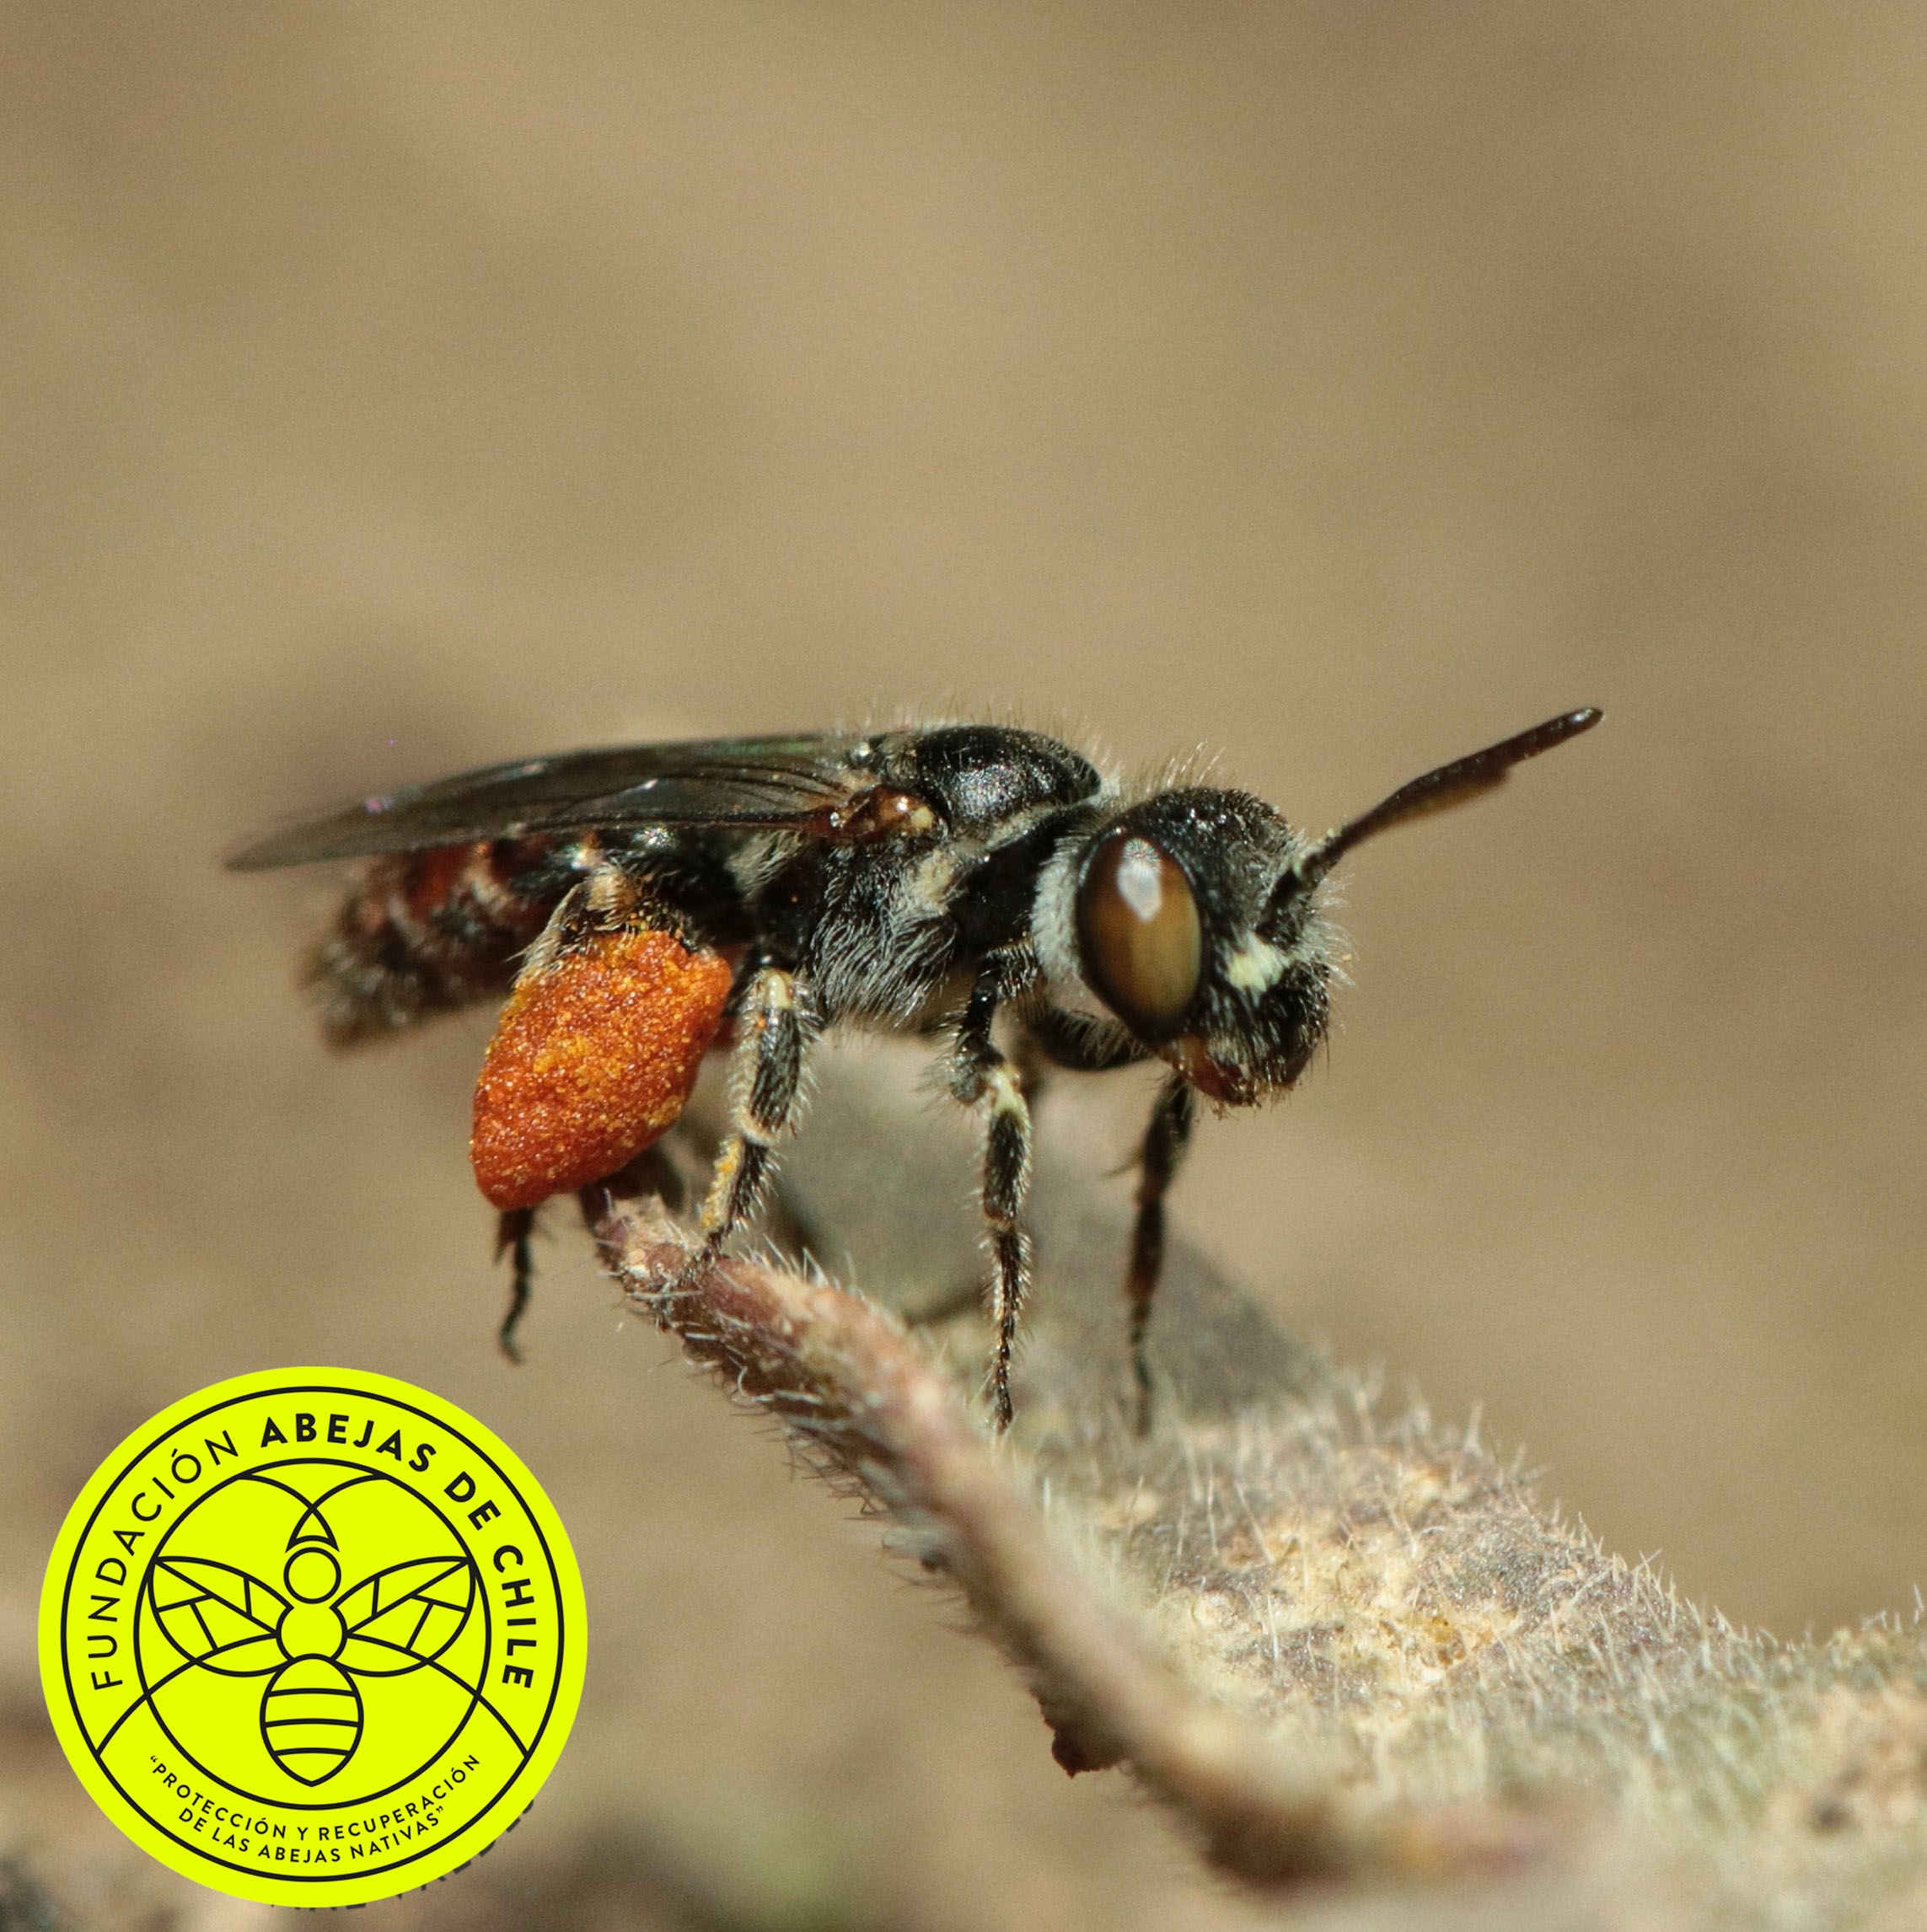 Liphanthus-sabulosus-Pablo-Vial-Valdés-Abejas-abeja-nativa-endémica-chile-wild-bee-de-experto-especialista-investigador-pequeñas